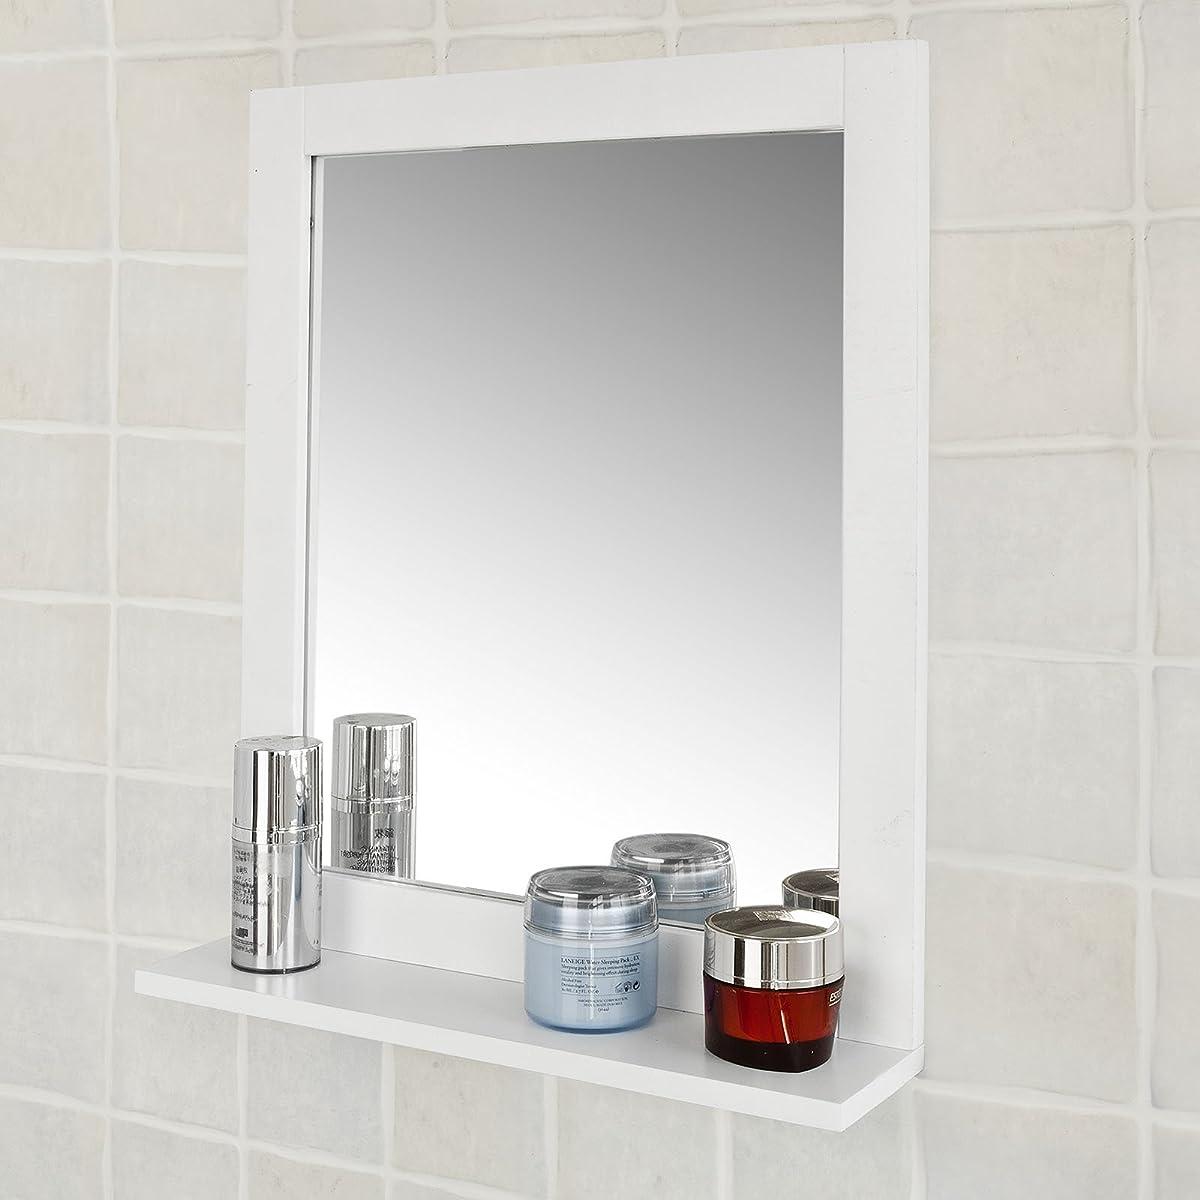 Haotian wall mounted bathroom mirror with shelf bathroom for Bathroom mirror set